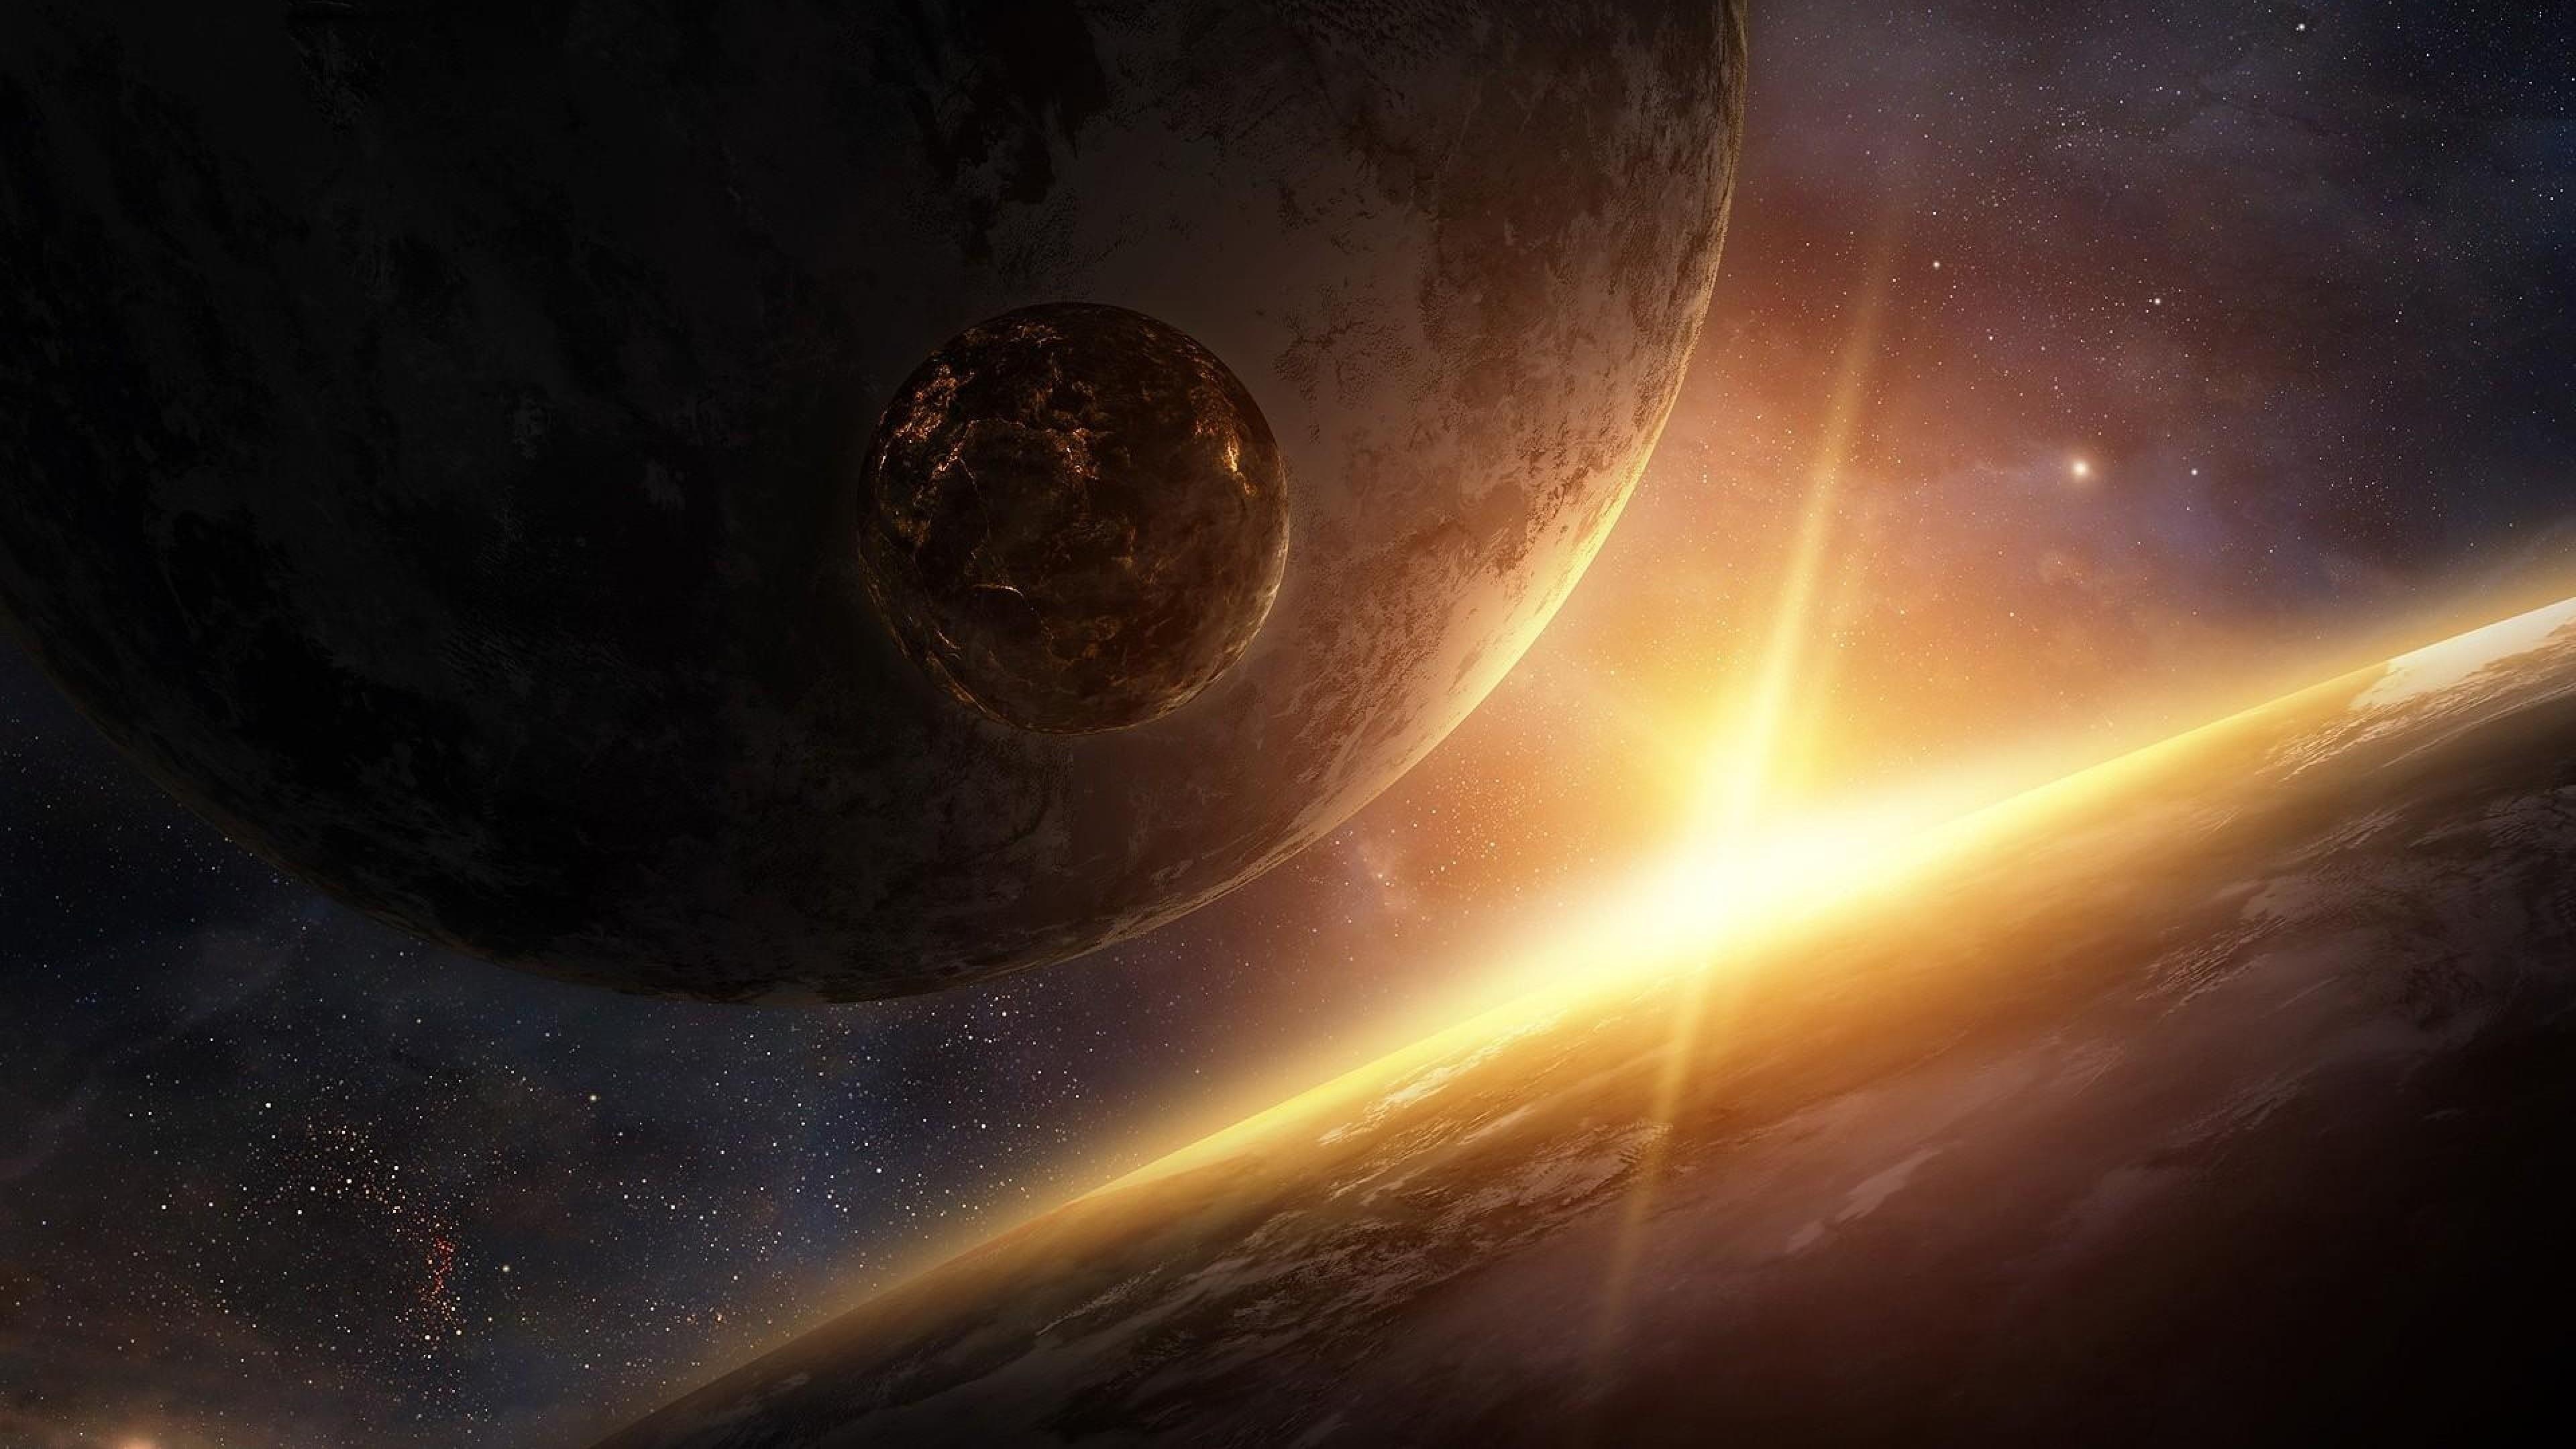 Download Wallpaper Planet, Rays, Light, Universe, Nebula 4K .